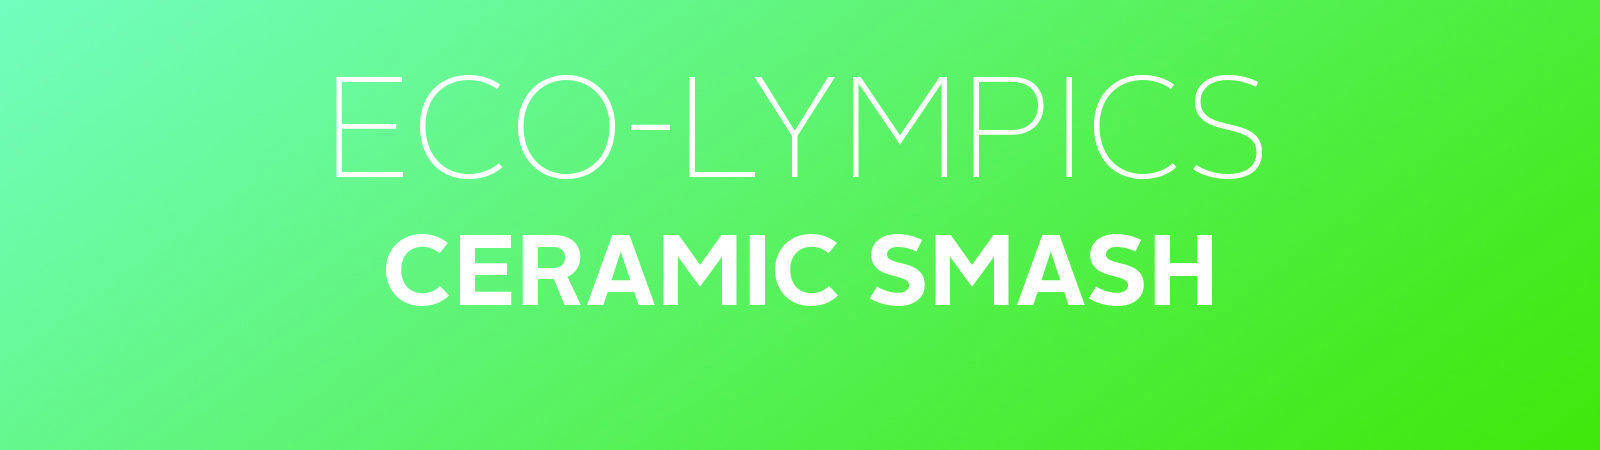 Eco-lympics Ceramic Smash